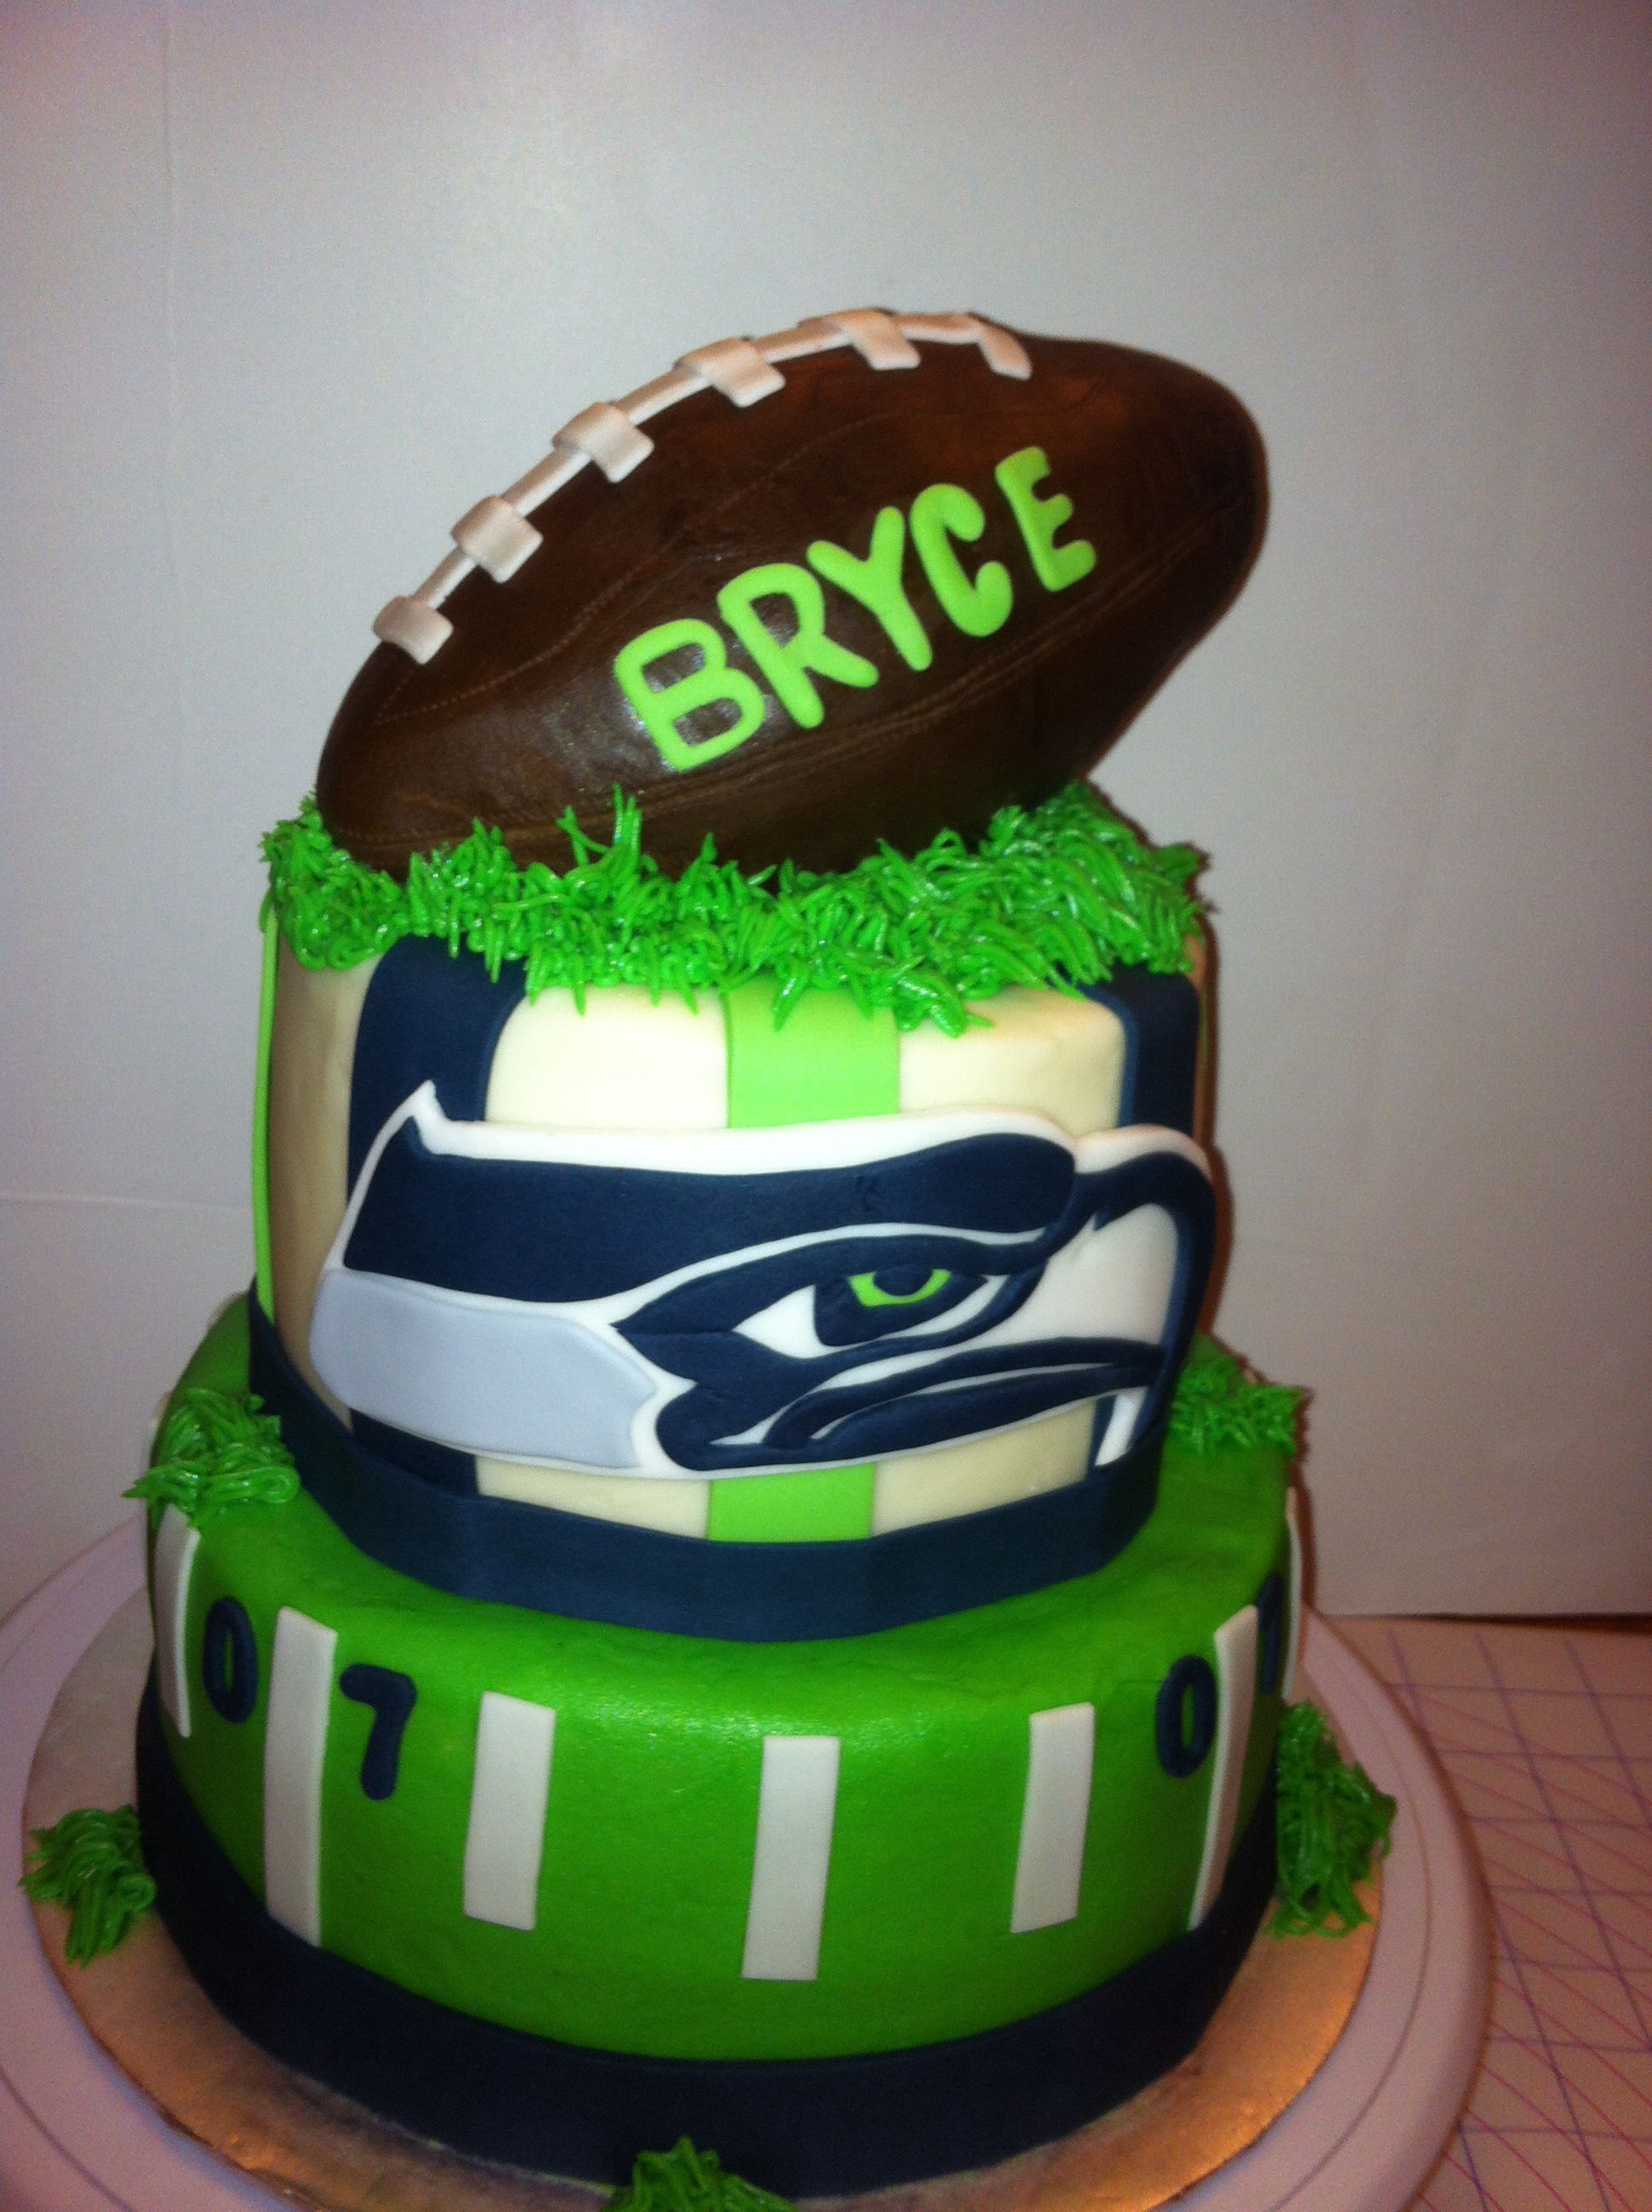 Cake Decorating Classes Seattle